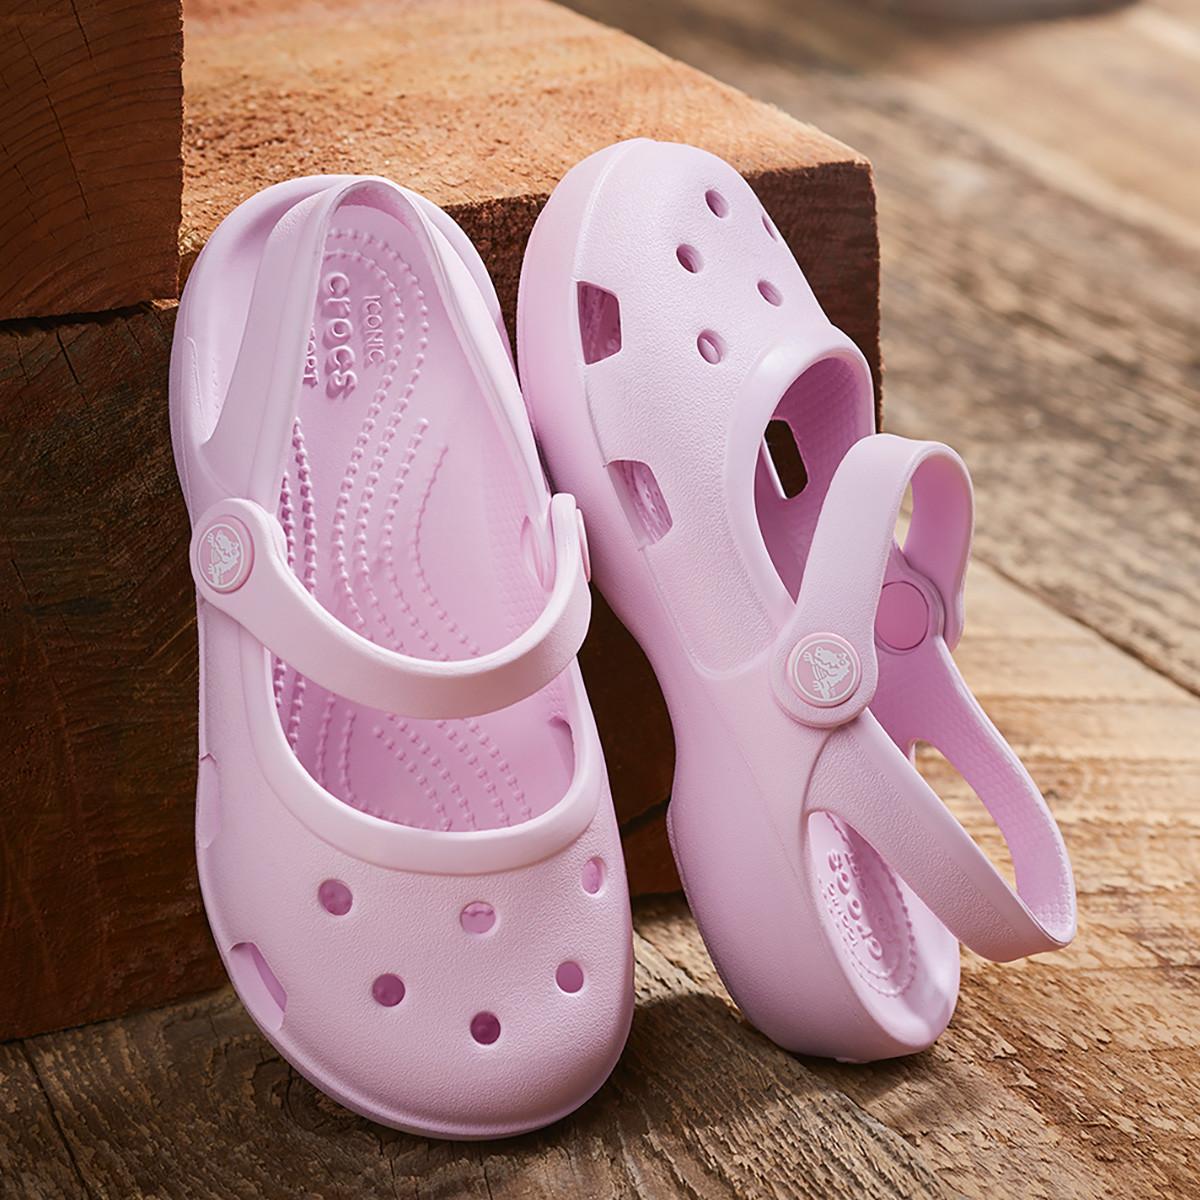 Crocs 卡骆驰 夏季女童玛丽珍洞洞鞋